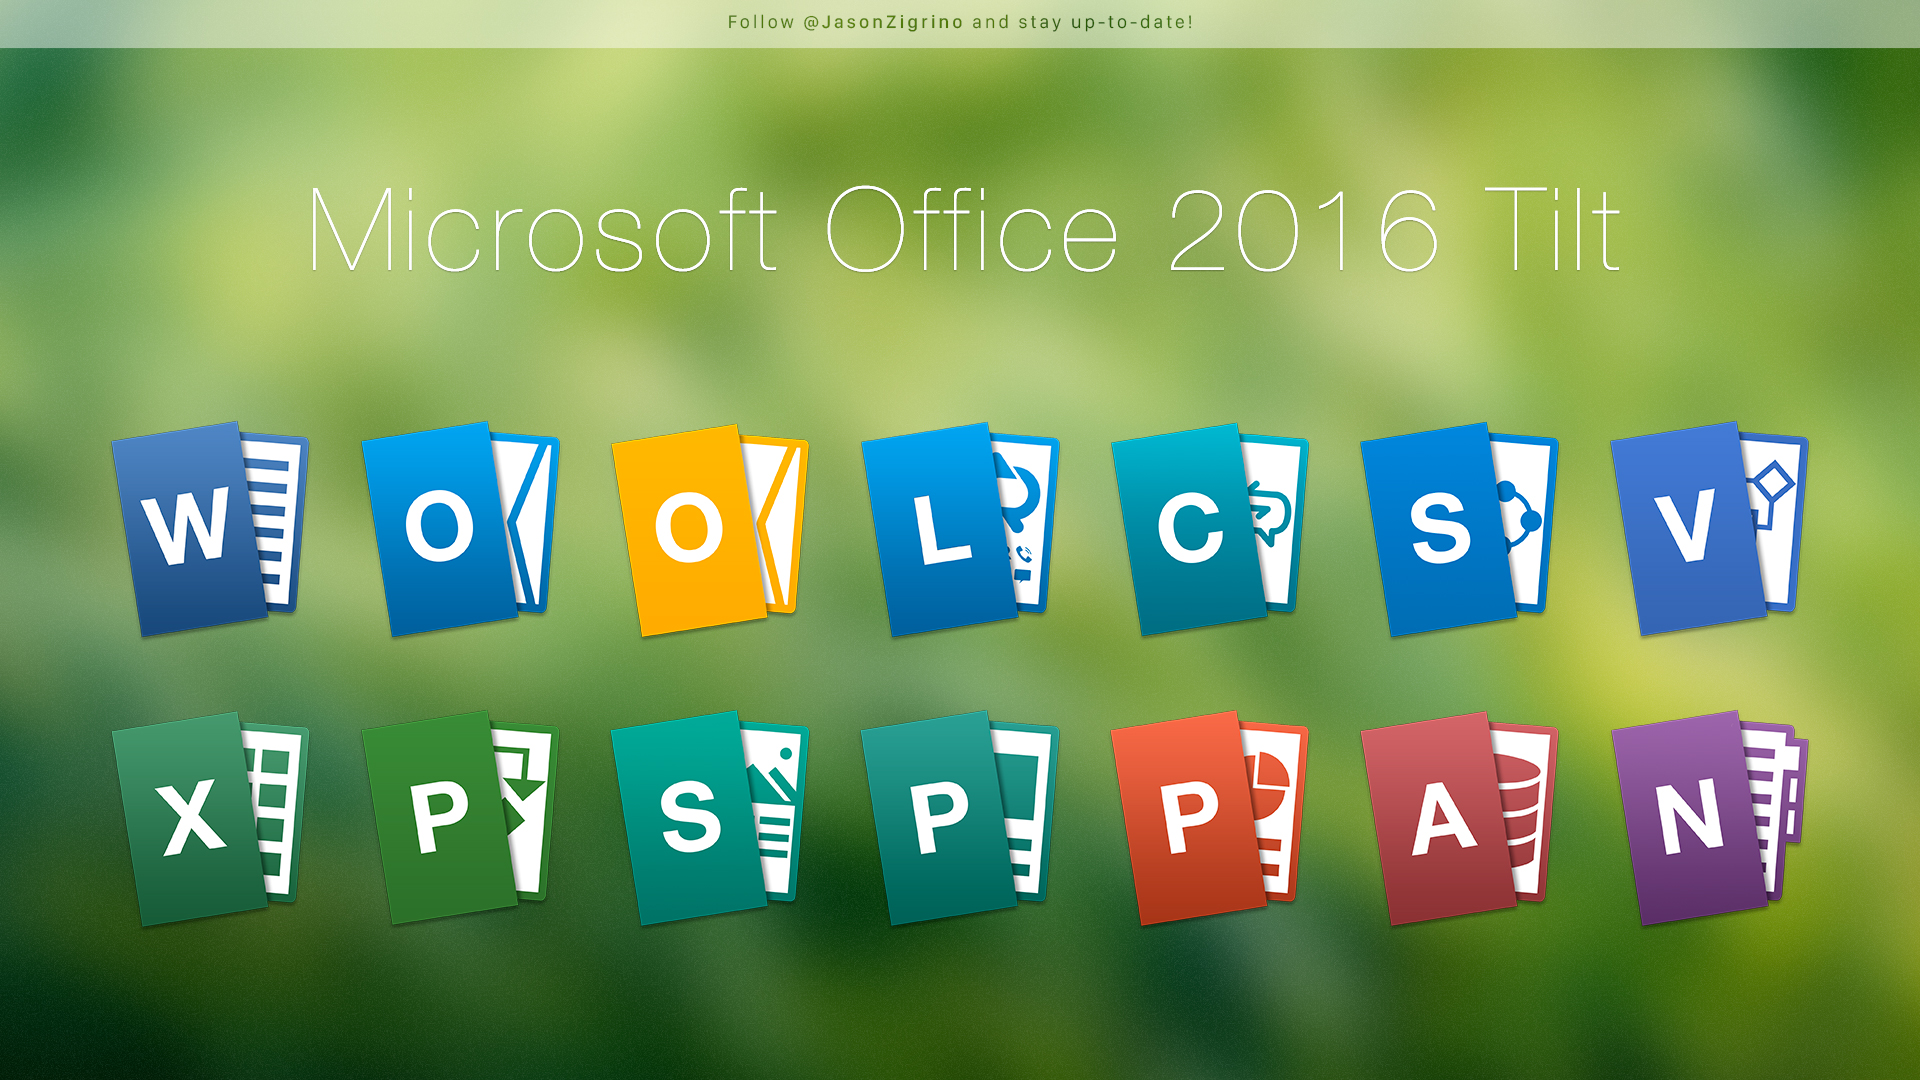 Microsoft Office For Mac 2016 By JasonZigrino